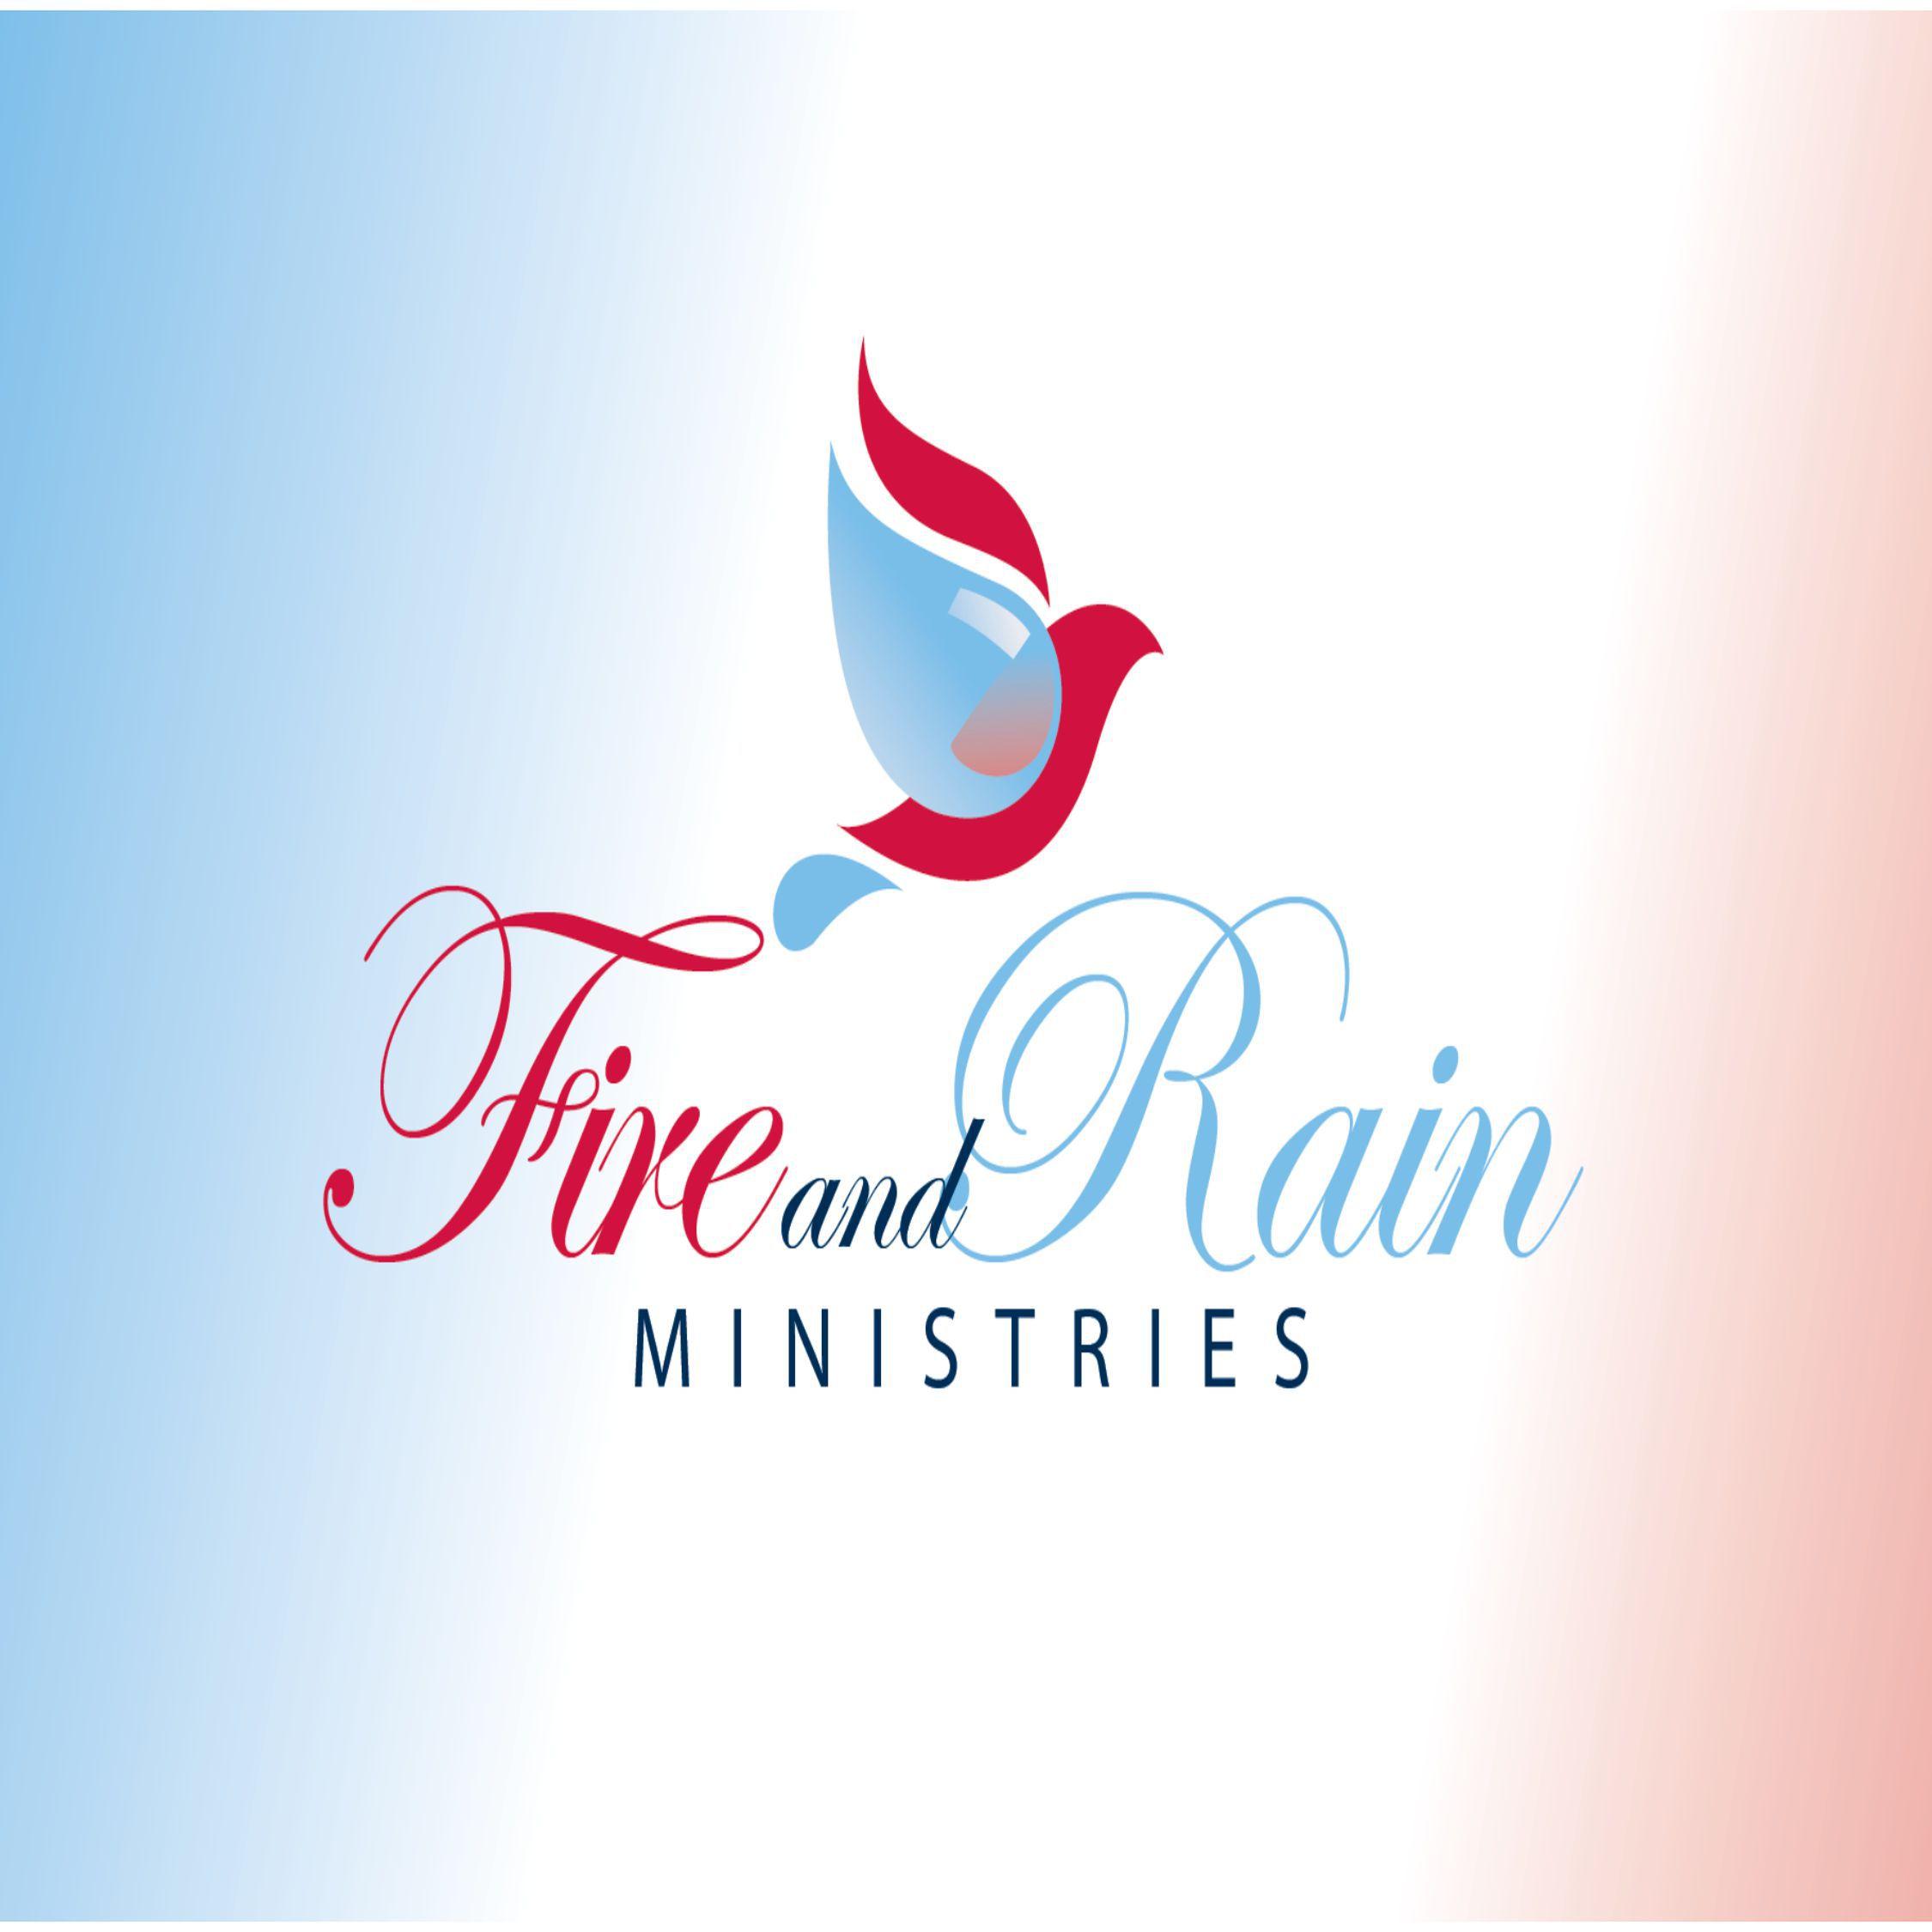 Fire and Rain Ministries